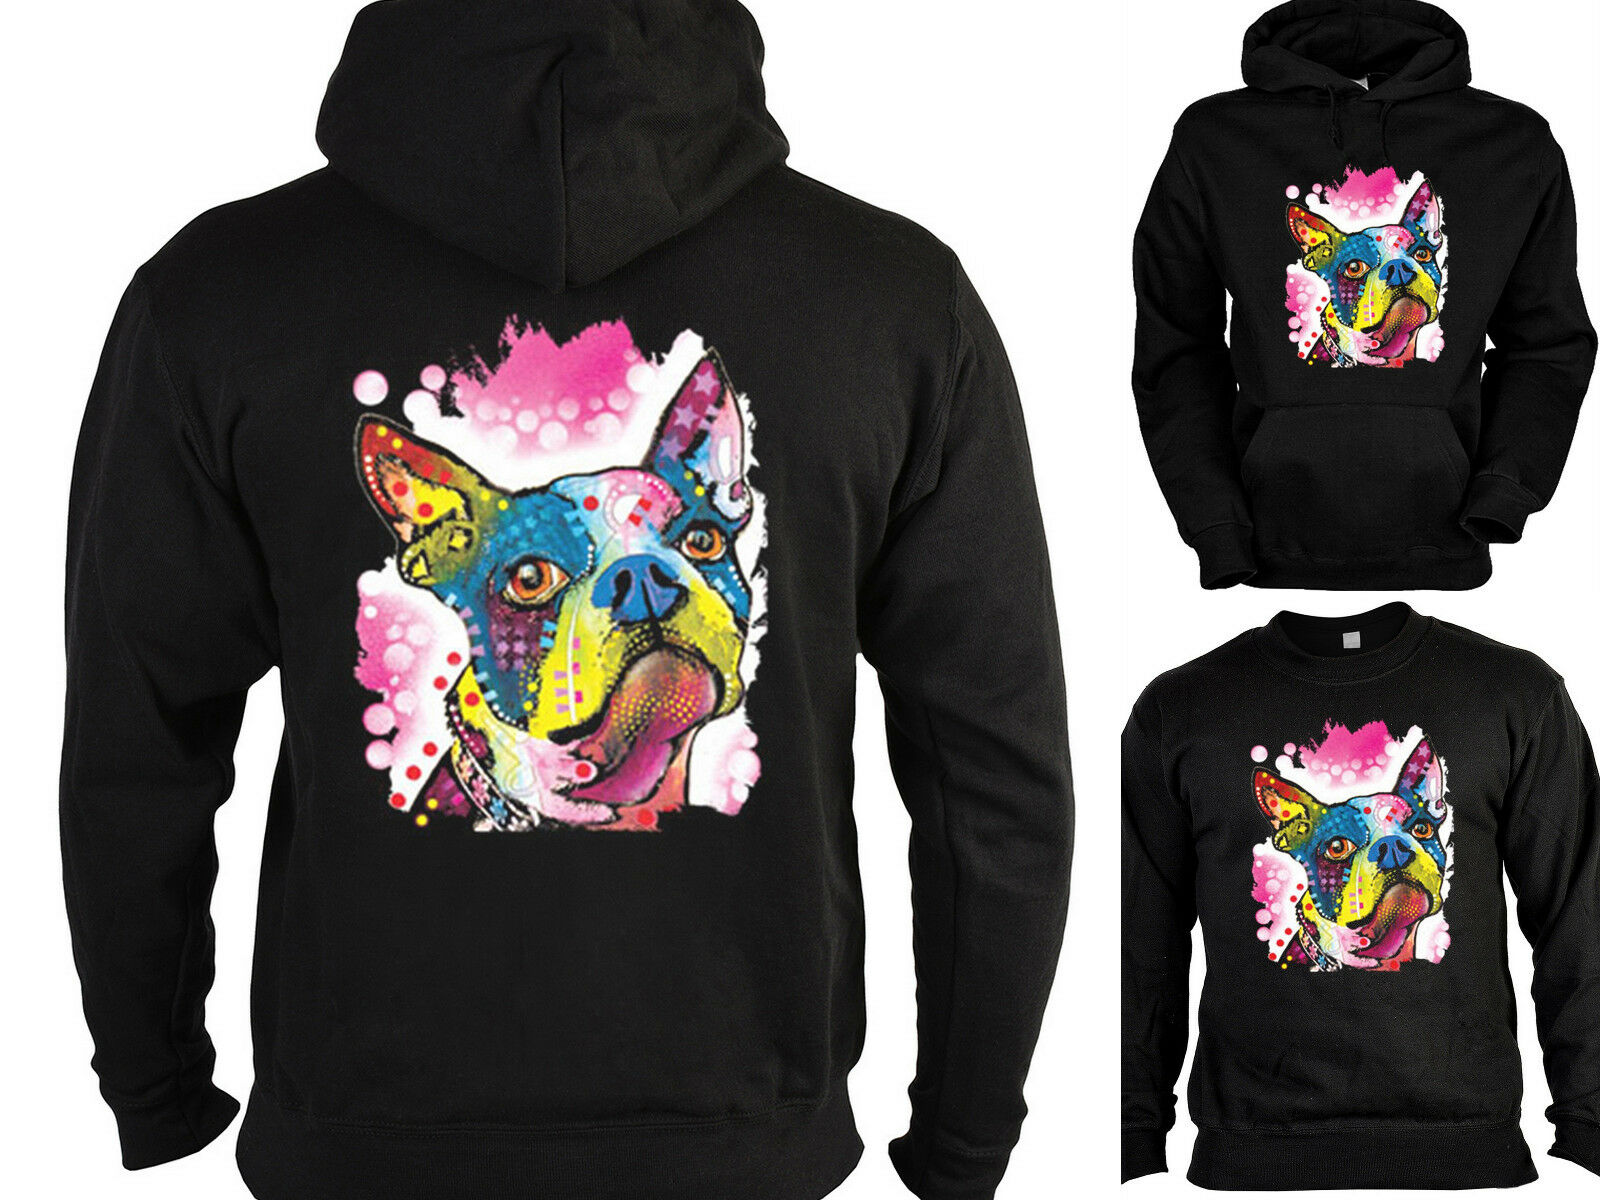 Boston Terrier Sweater - Kapuzensweater - Zip Hoodie Hunderassen Hunde Motiv